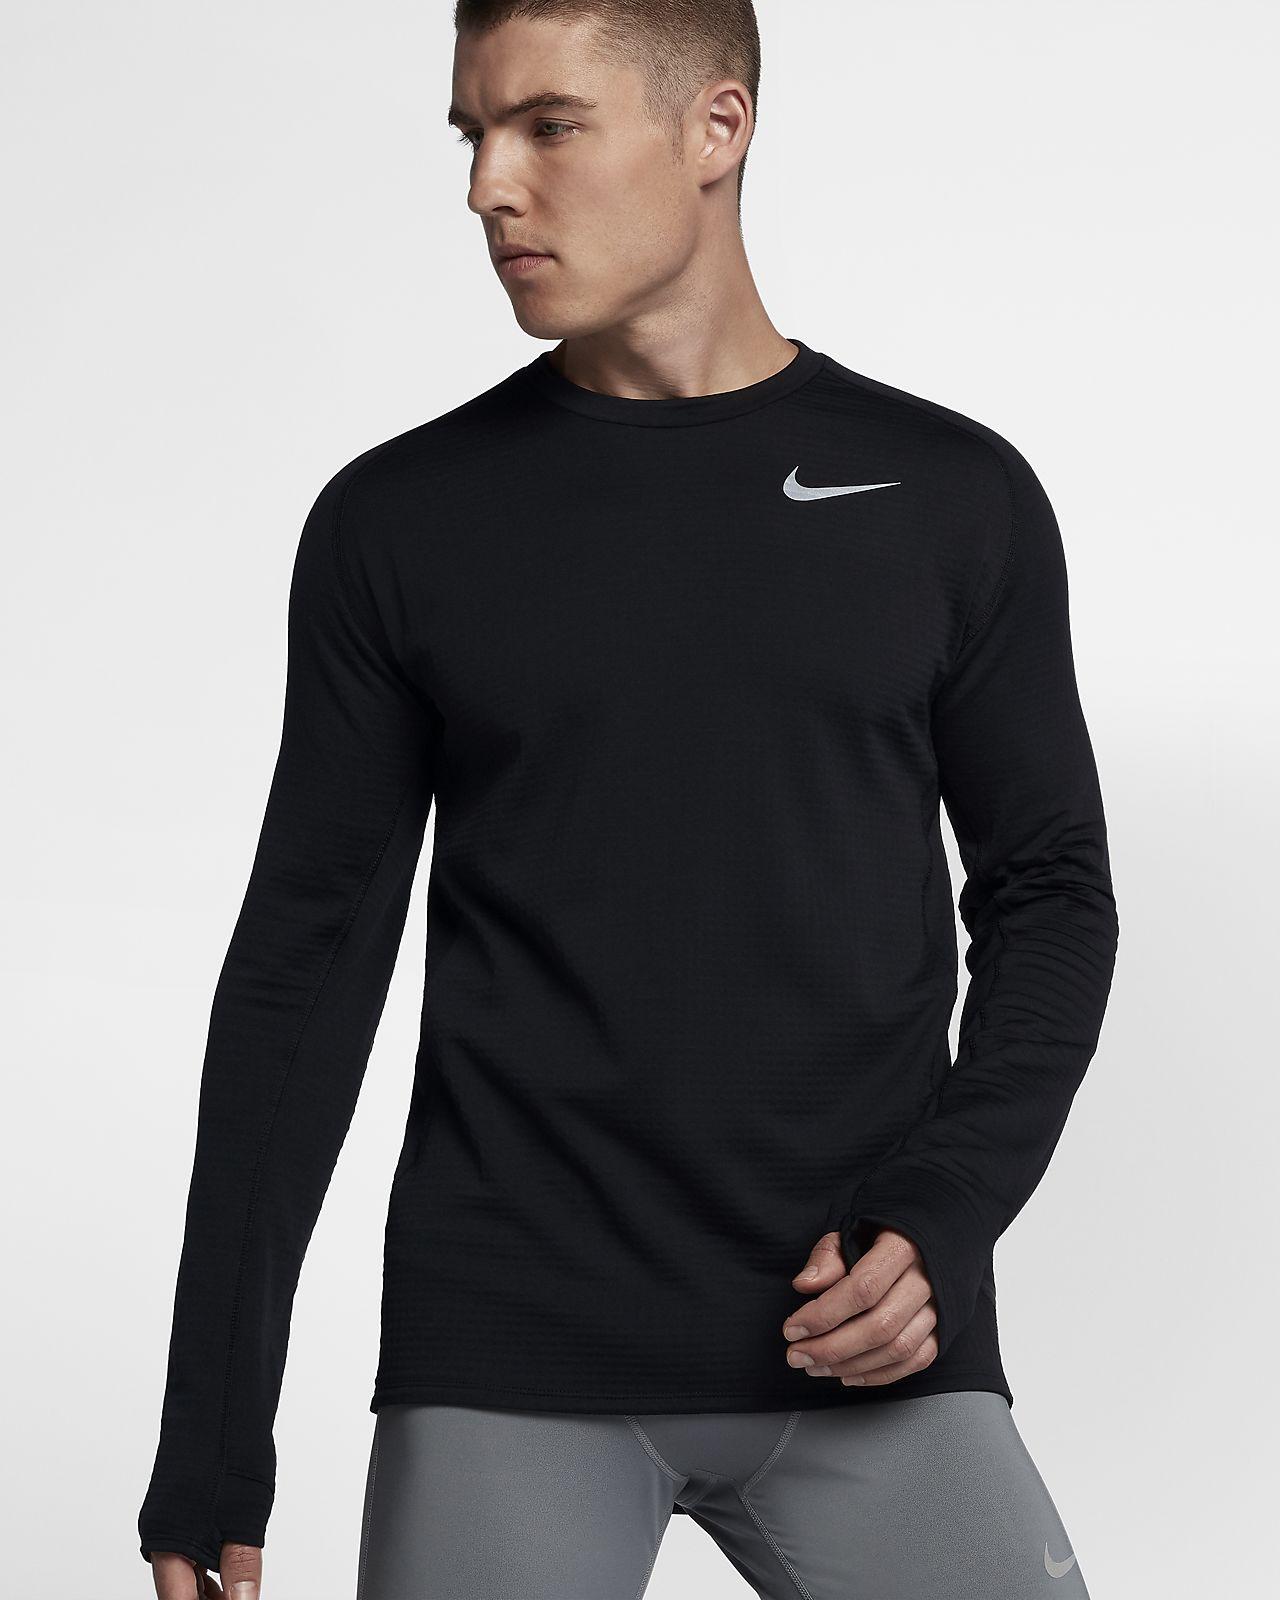 e077b3f881ef4 ... Haut de running à manches longues Nike Therma Sphere pour Homme